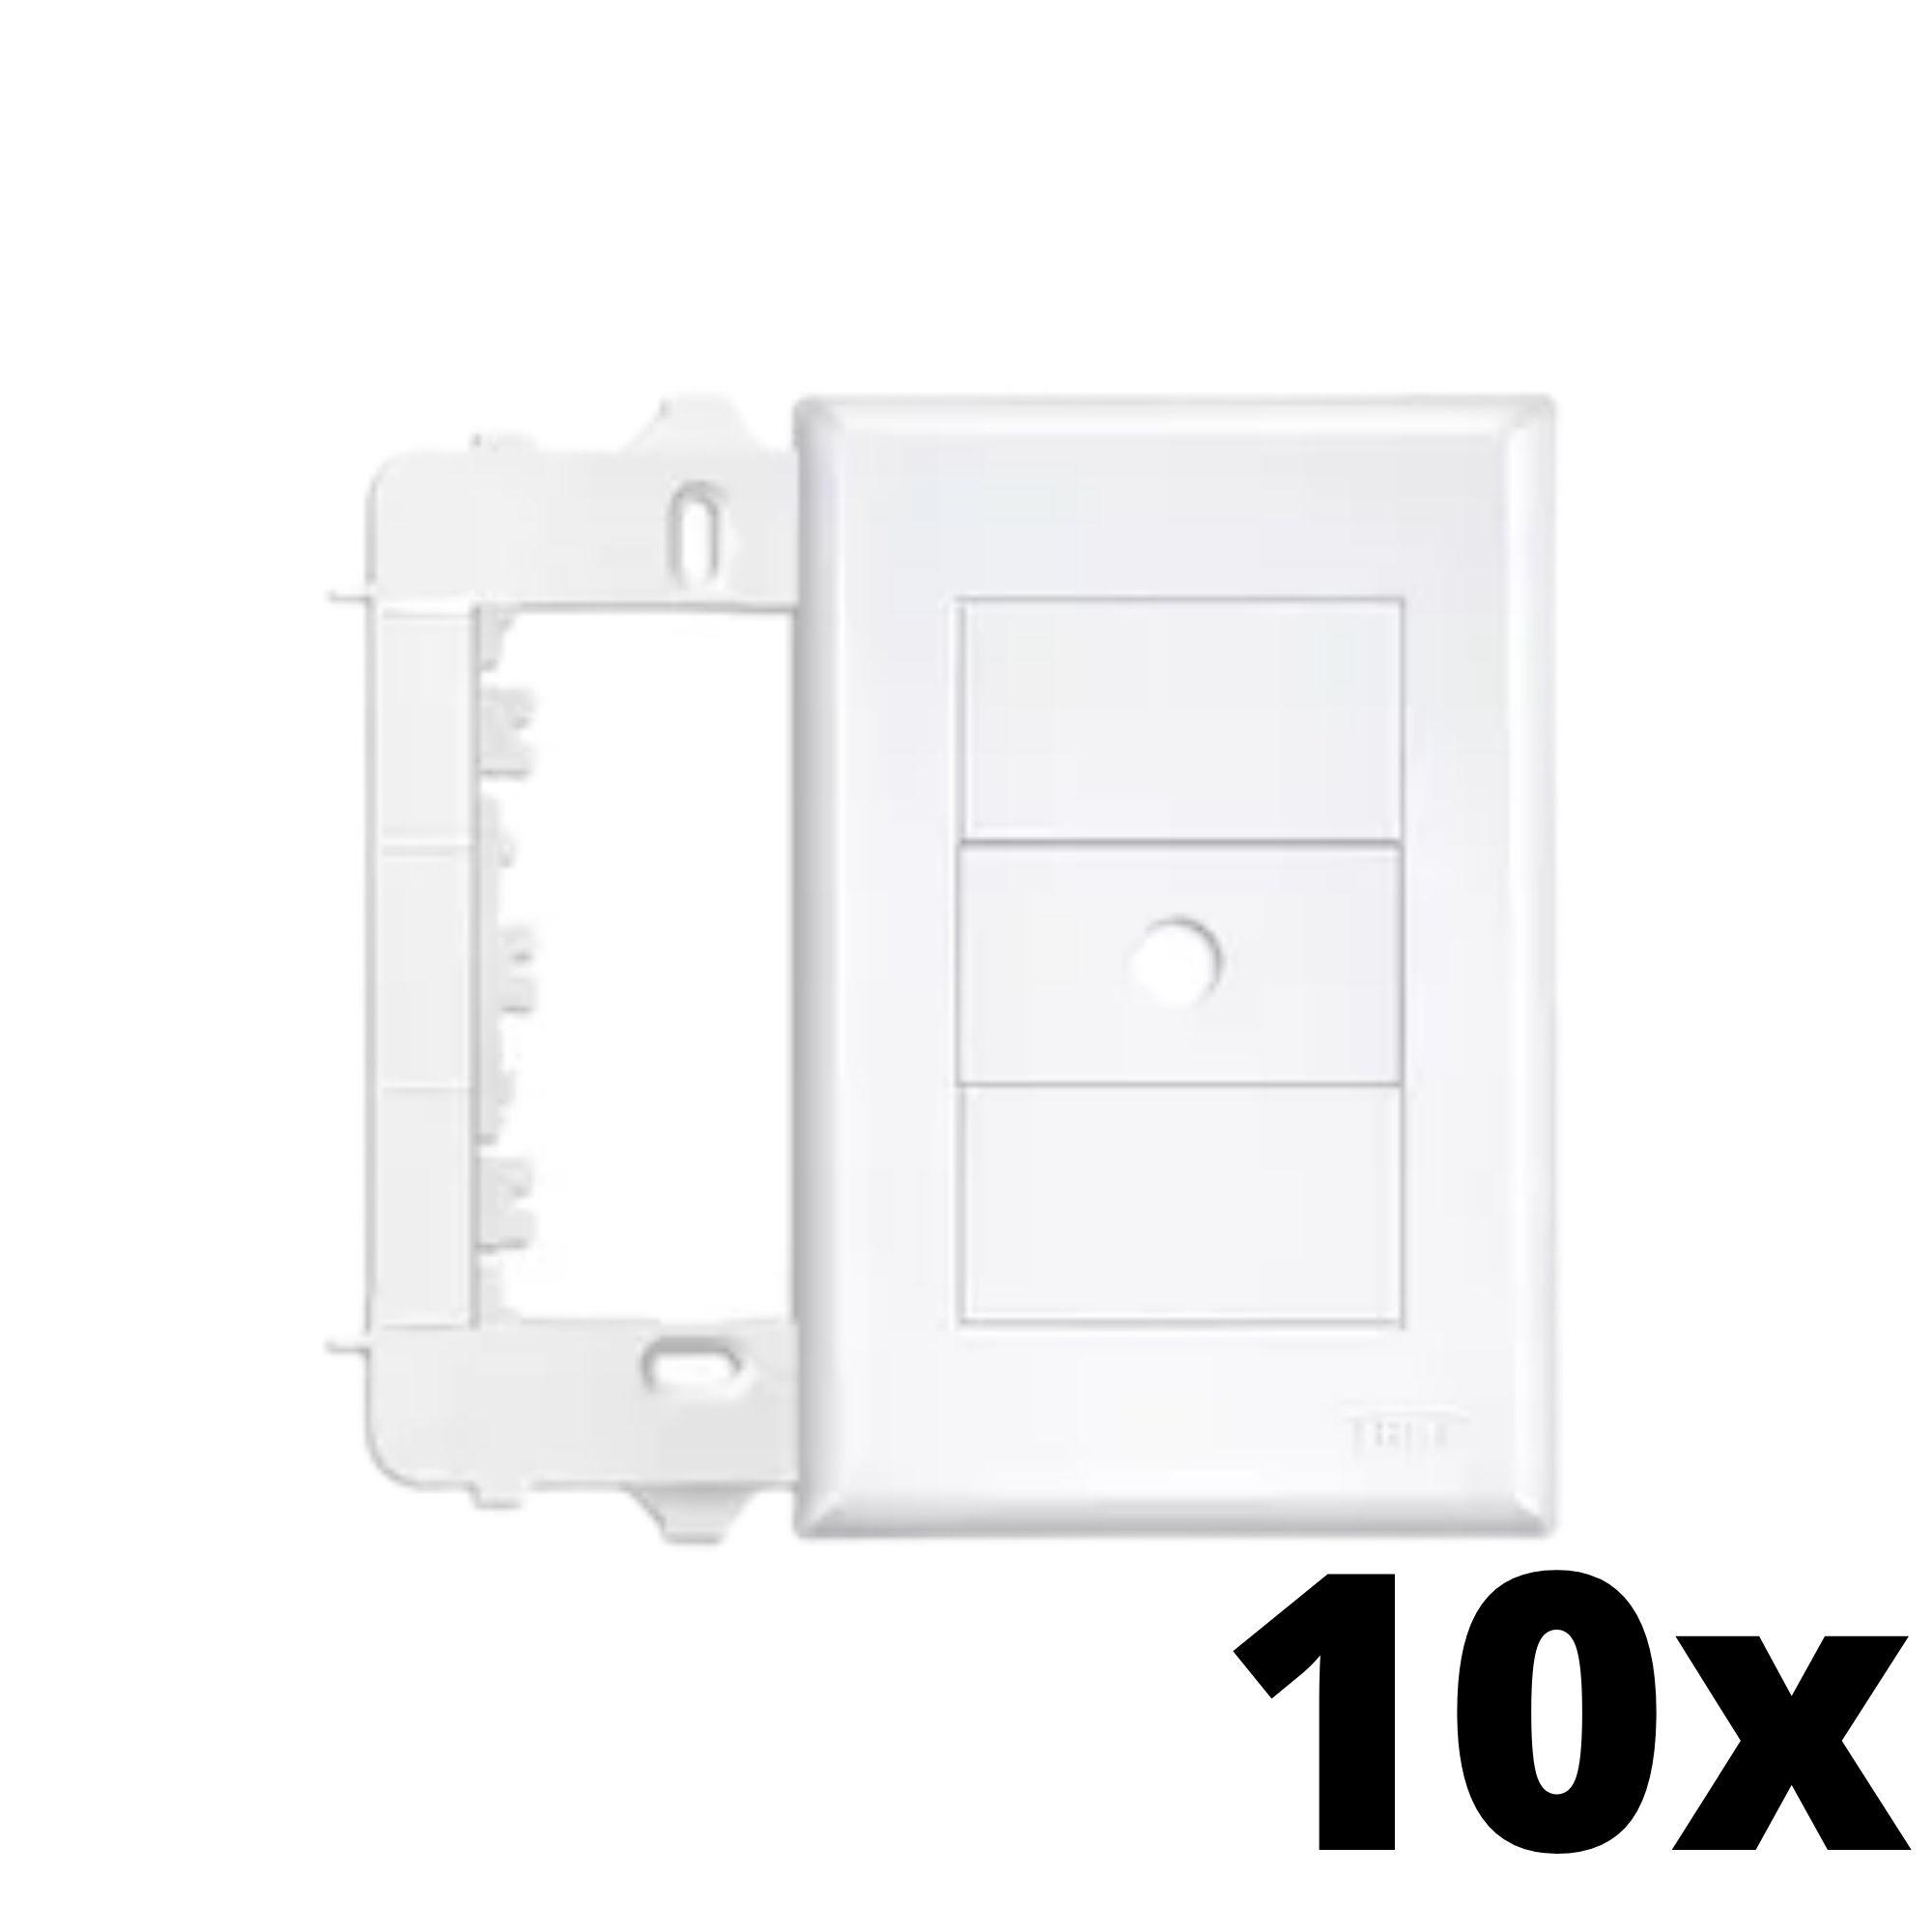 Kit 10 und Evidence Placa 4x2 Com Furo